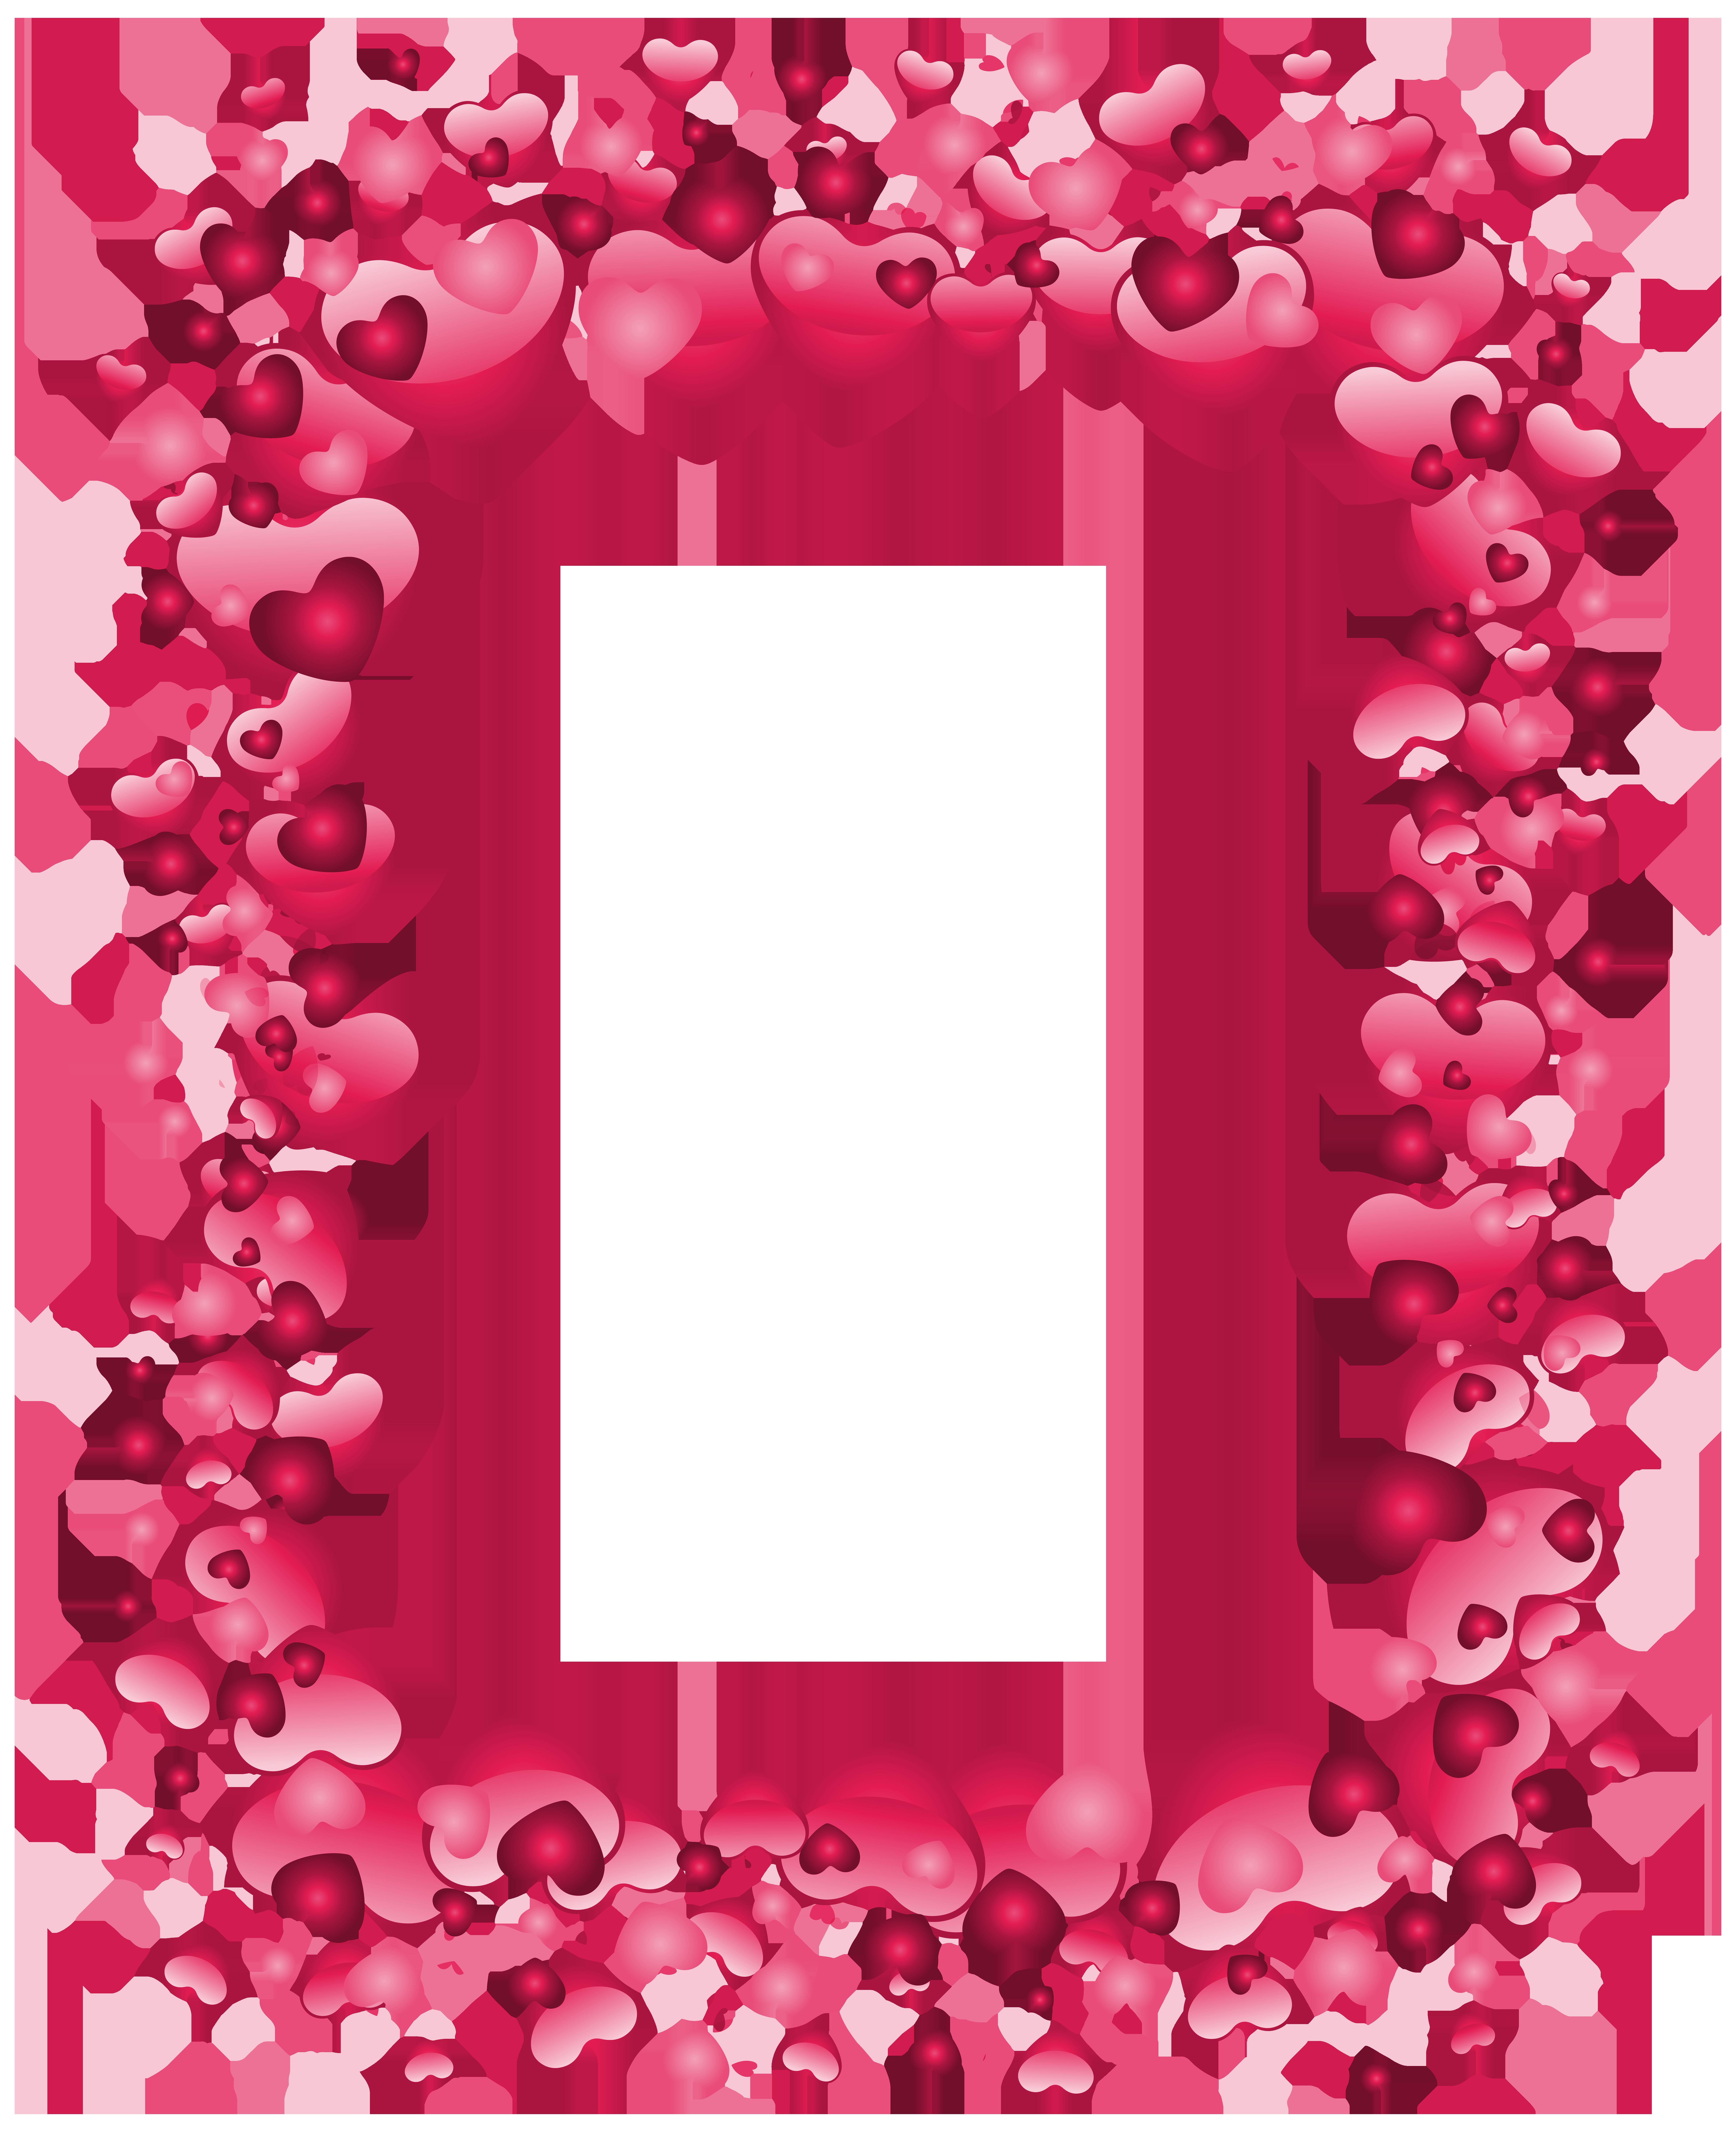 Heart Border Clipart Transparent.